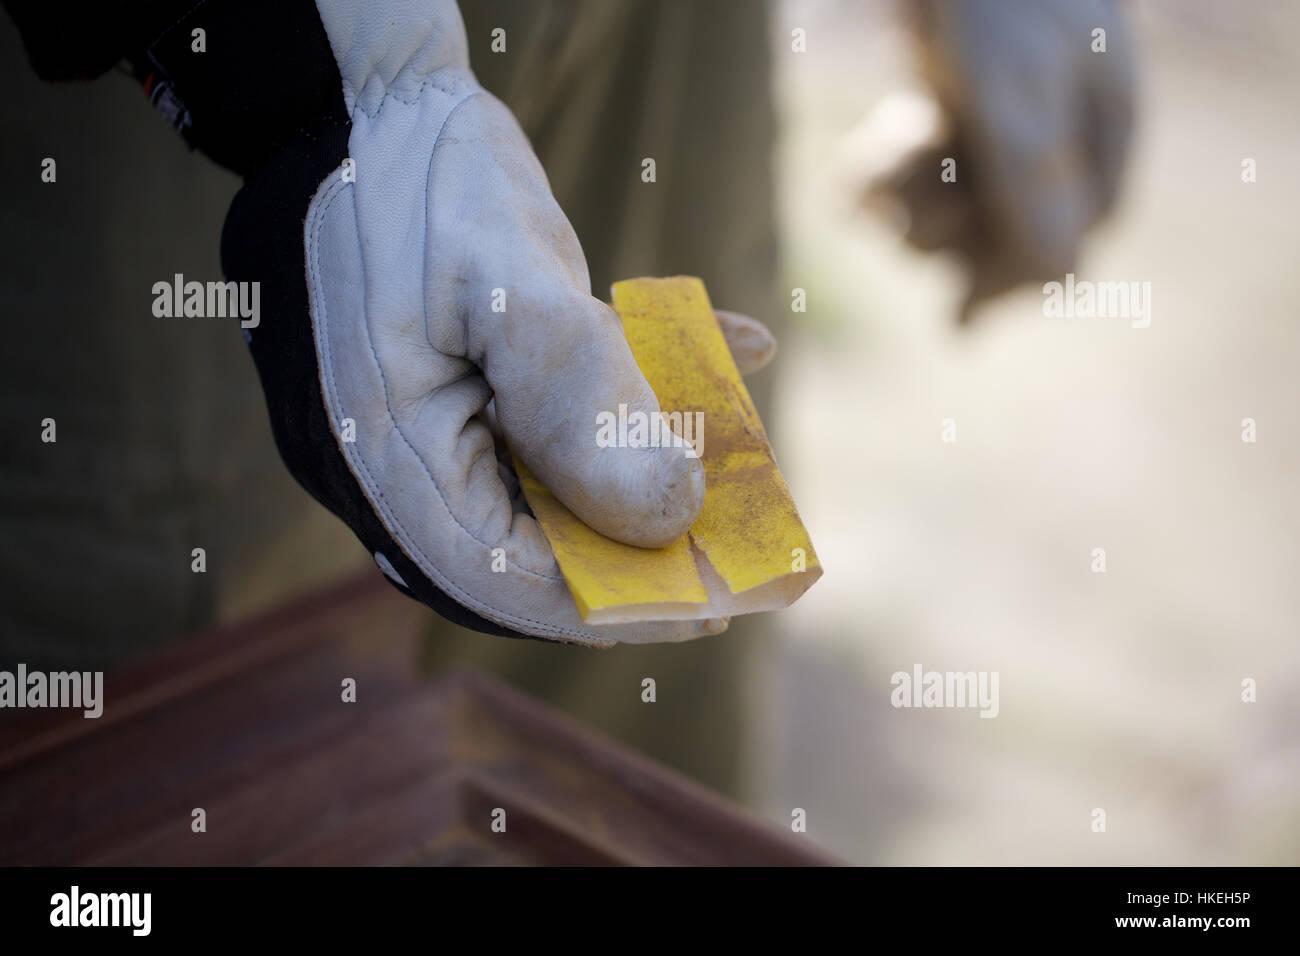 carpenter holding sandpaper. hand, glove, worker, sand paper. - Stock Image